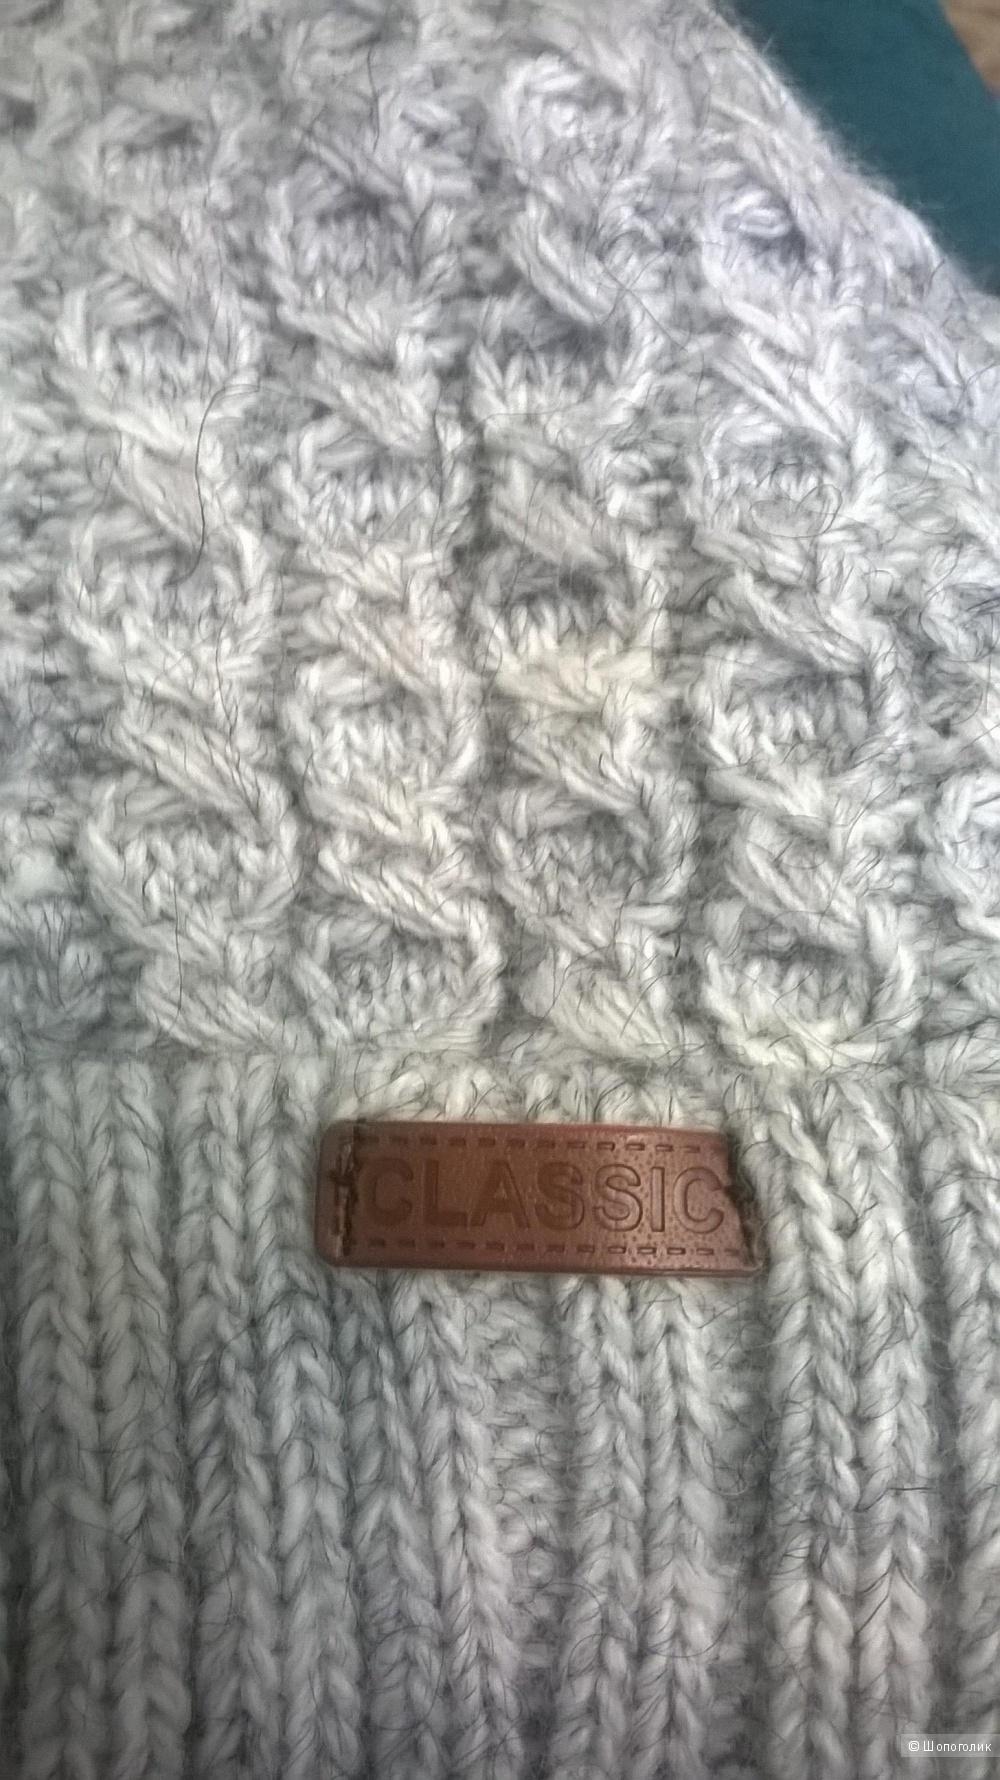 Зимняя женская шапочка, без бренда.